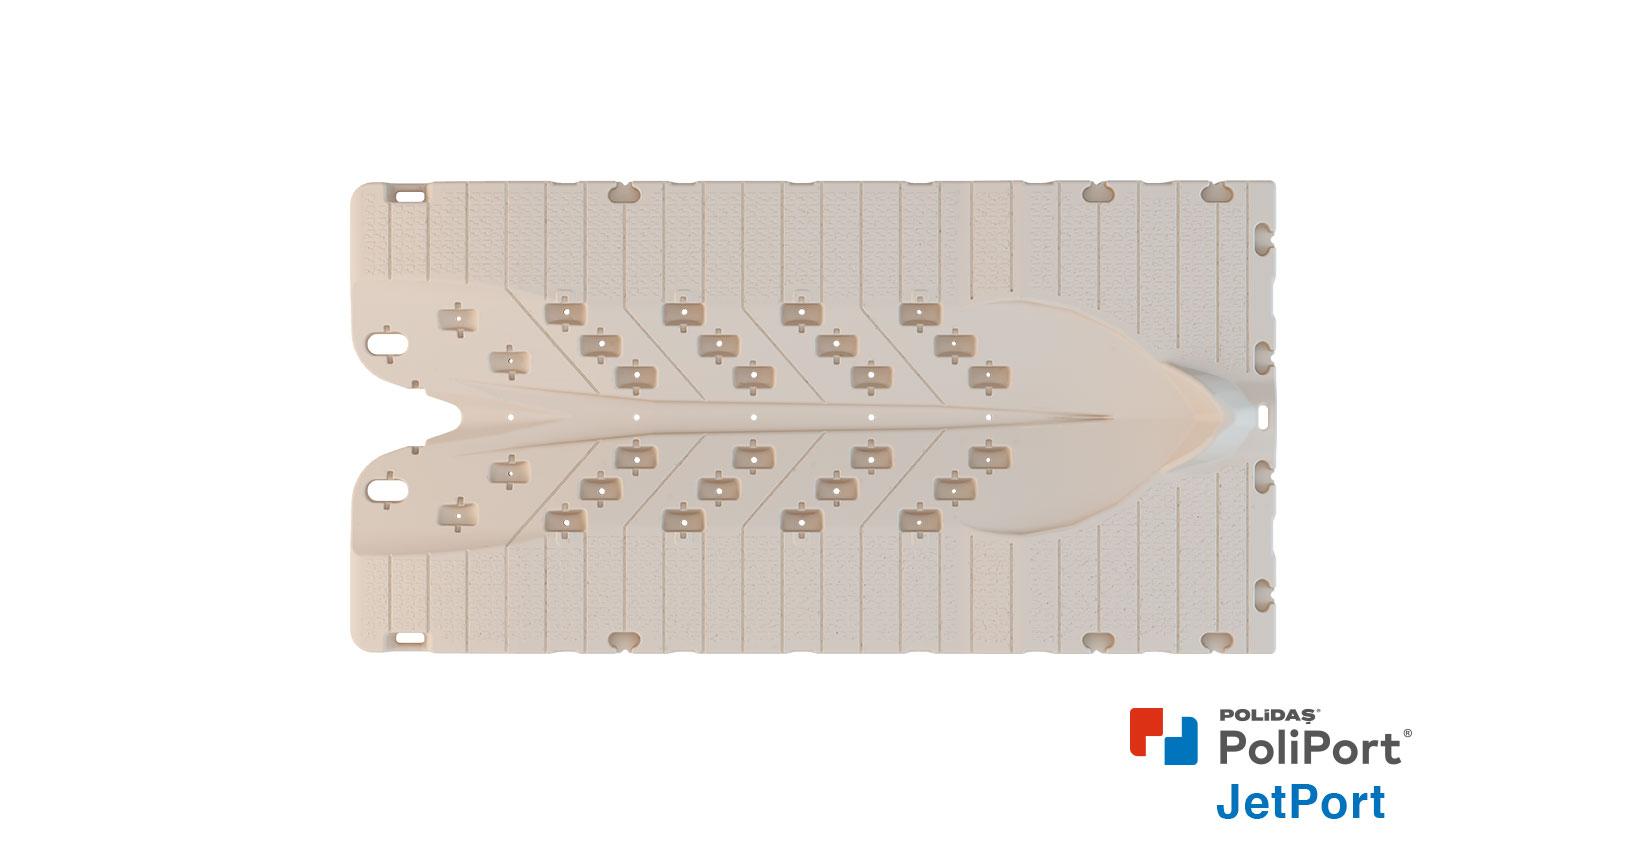 polietilen-jetski-parki-platform-3